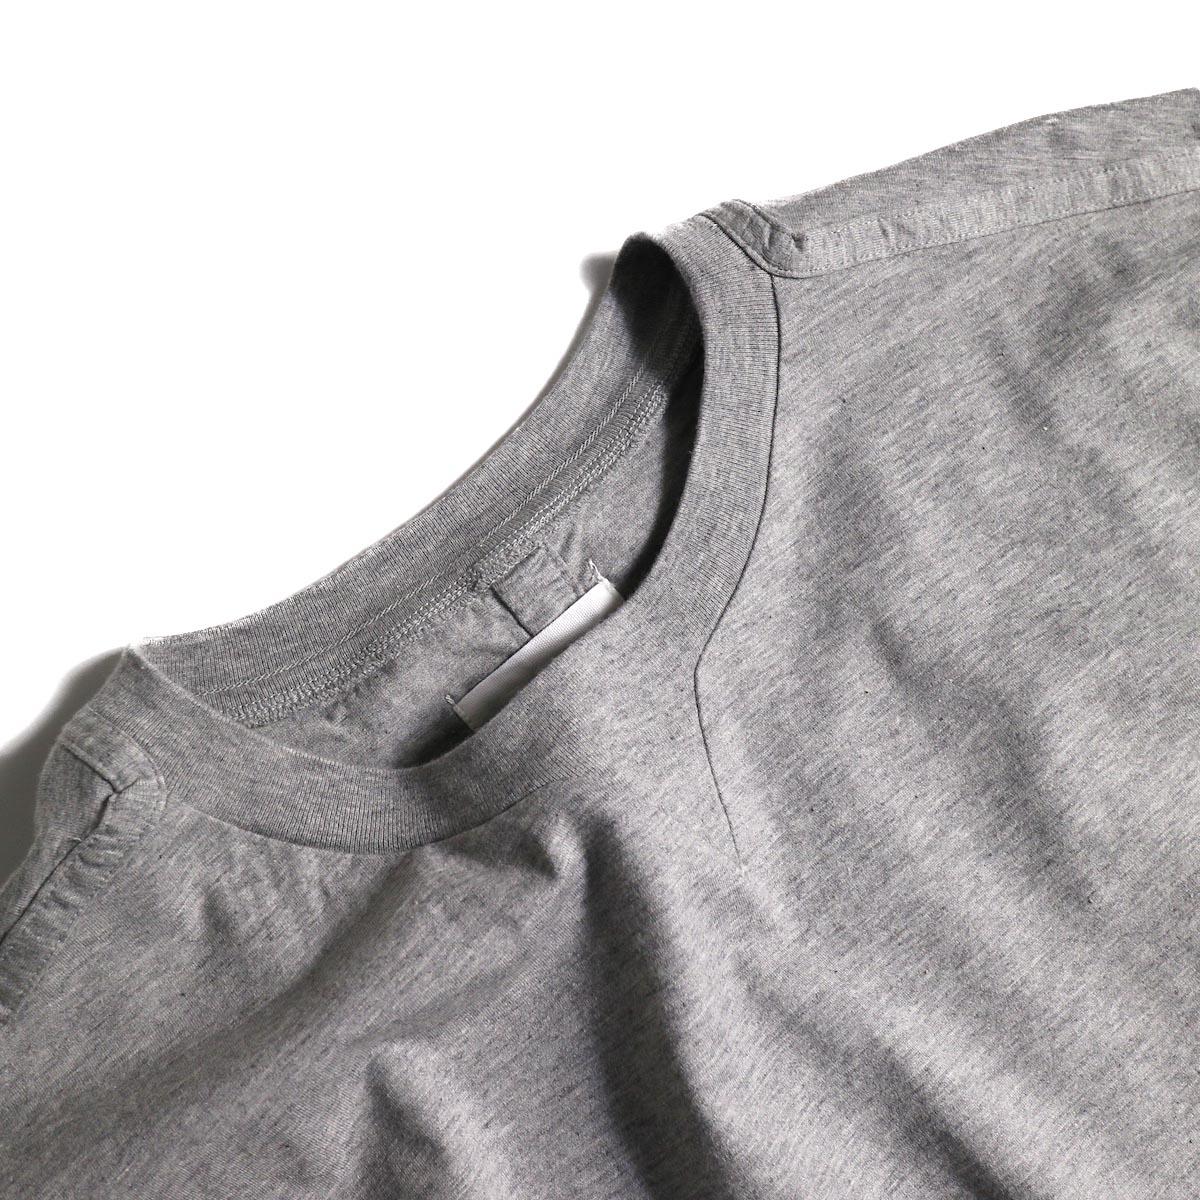 The Soloist / swc.0007a crew neck s/s tee (Gray)ガセット